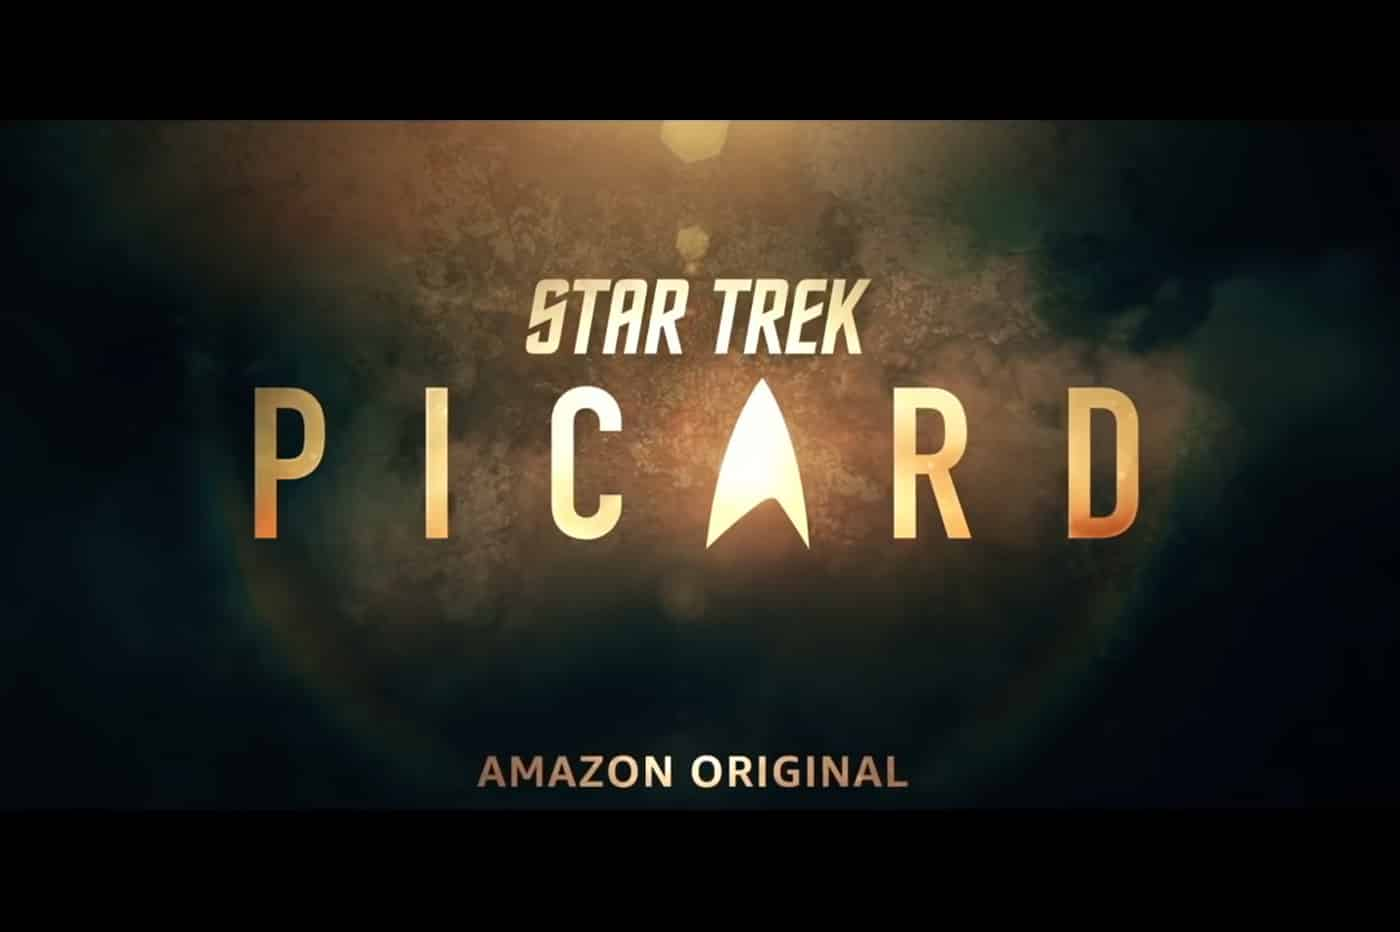 Star-Trek-Picard-Logo